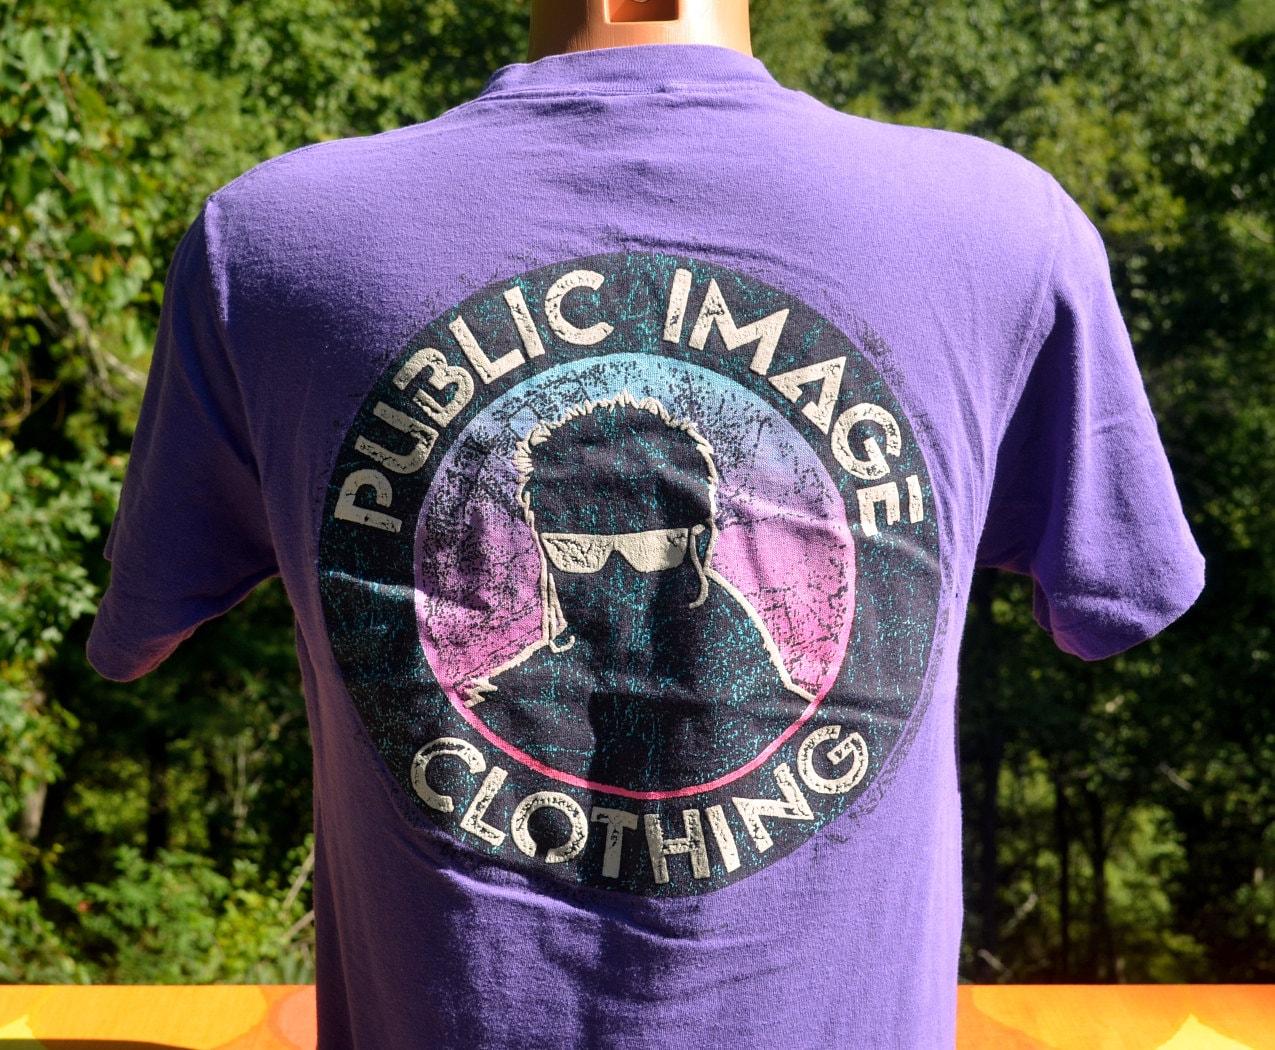 Buy vintage public image brand shirts